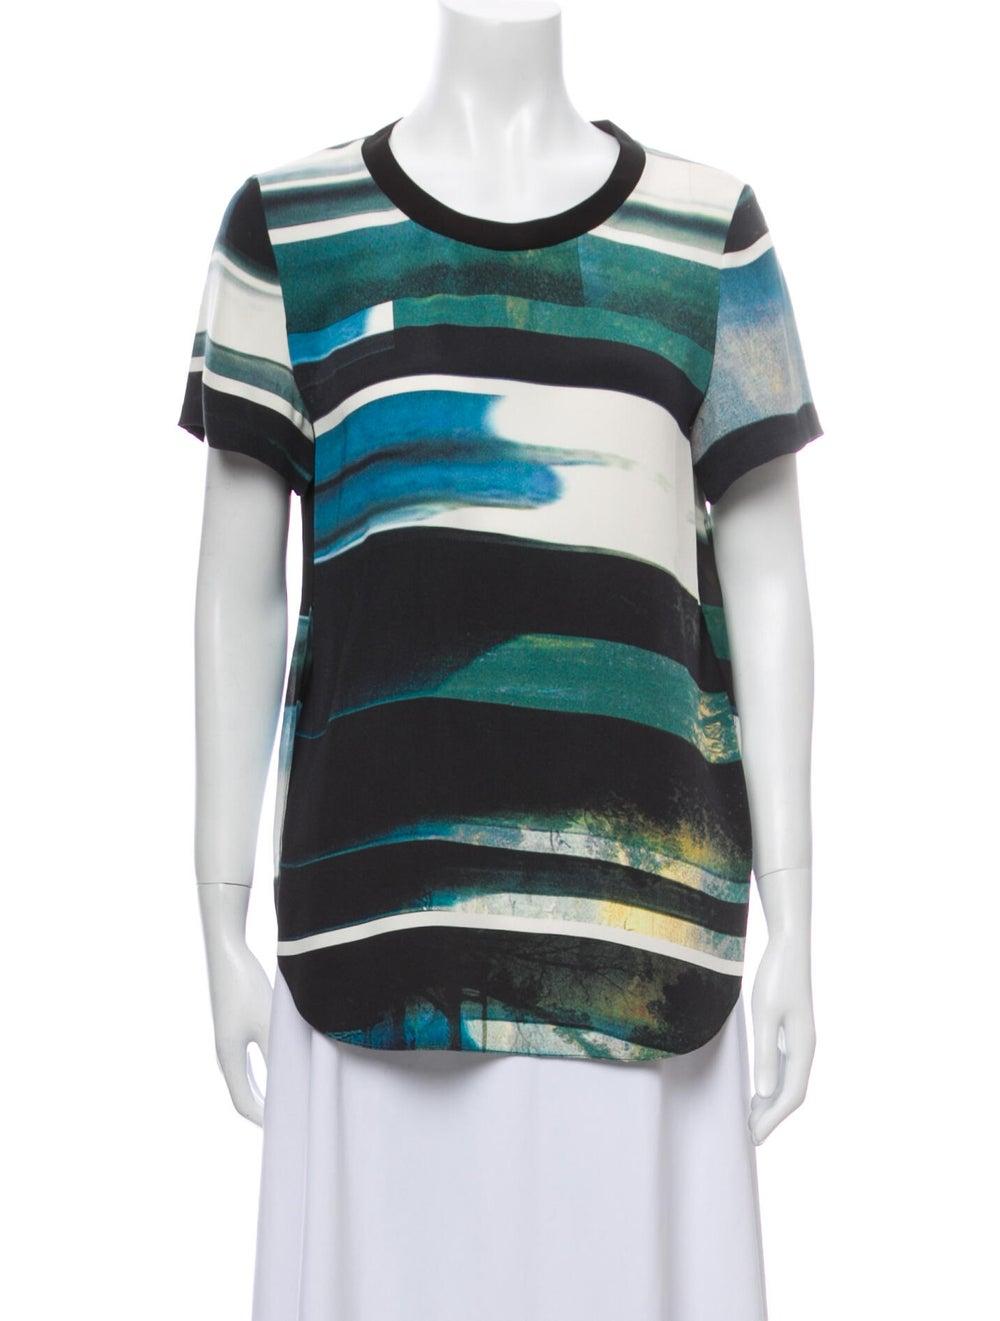 3.1 Phillip Lim Silk Striped T-Shirt Green - image 1